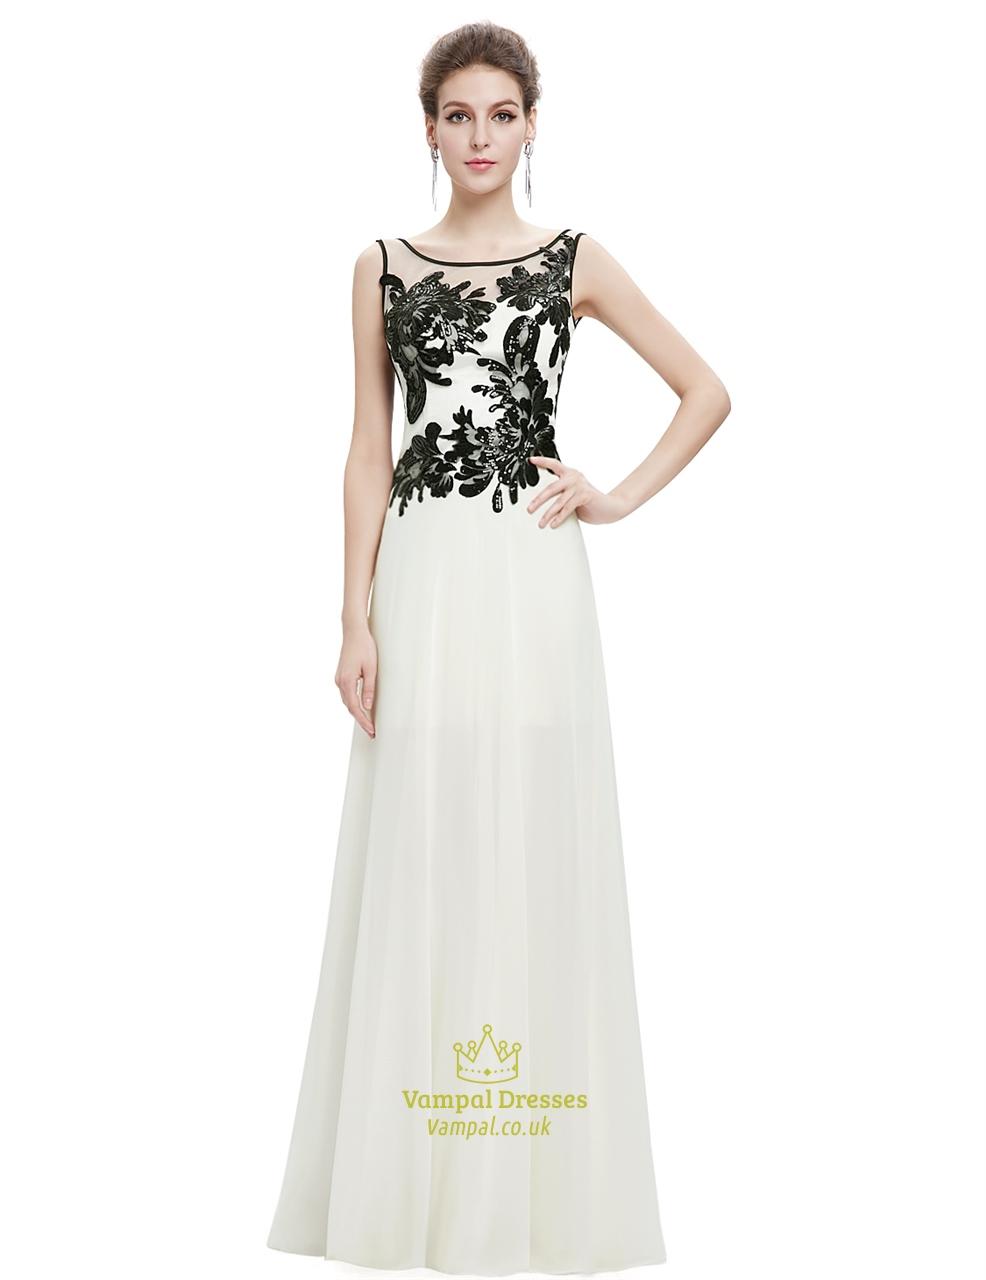 9e8cb81535 √ Ivory Chiffon Long Prom Dress With Black Lace Applique